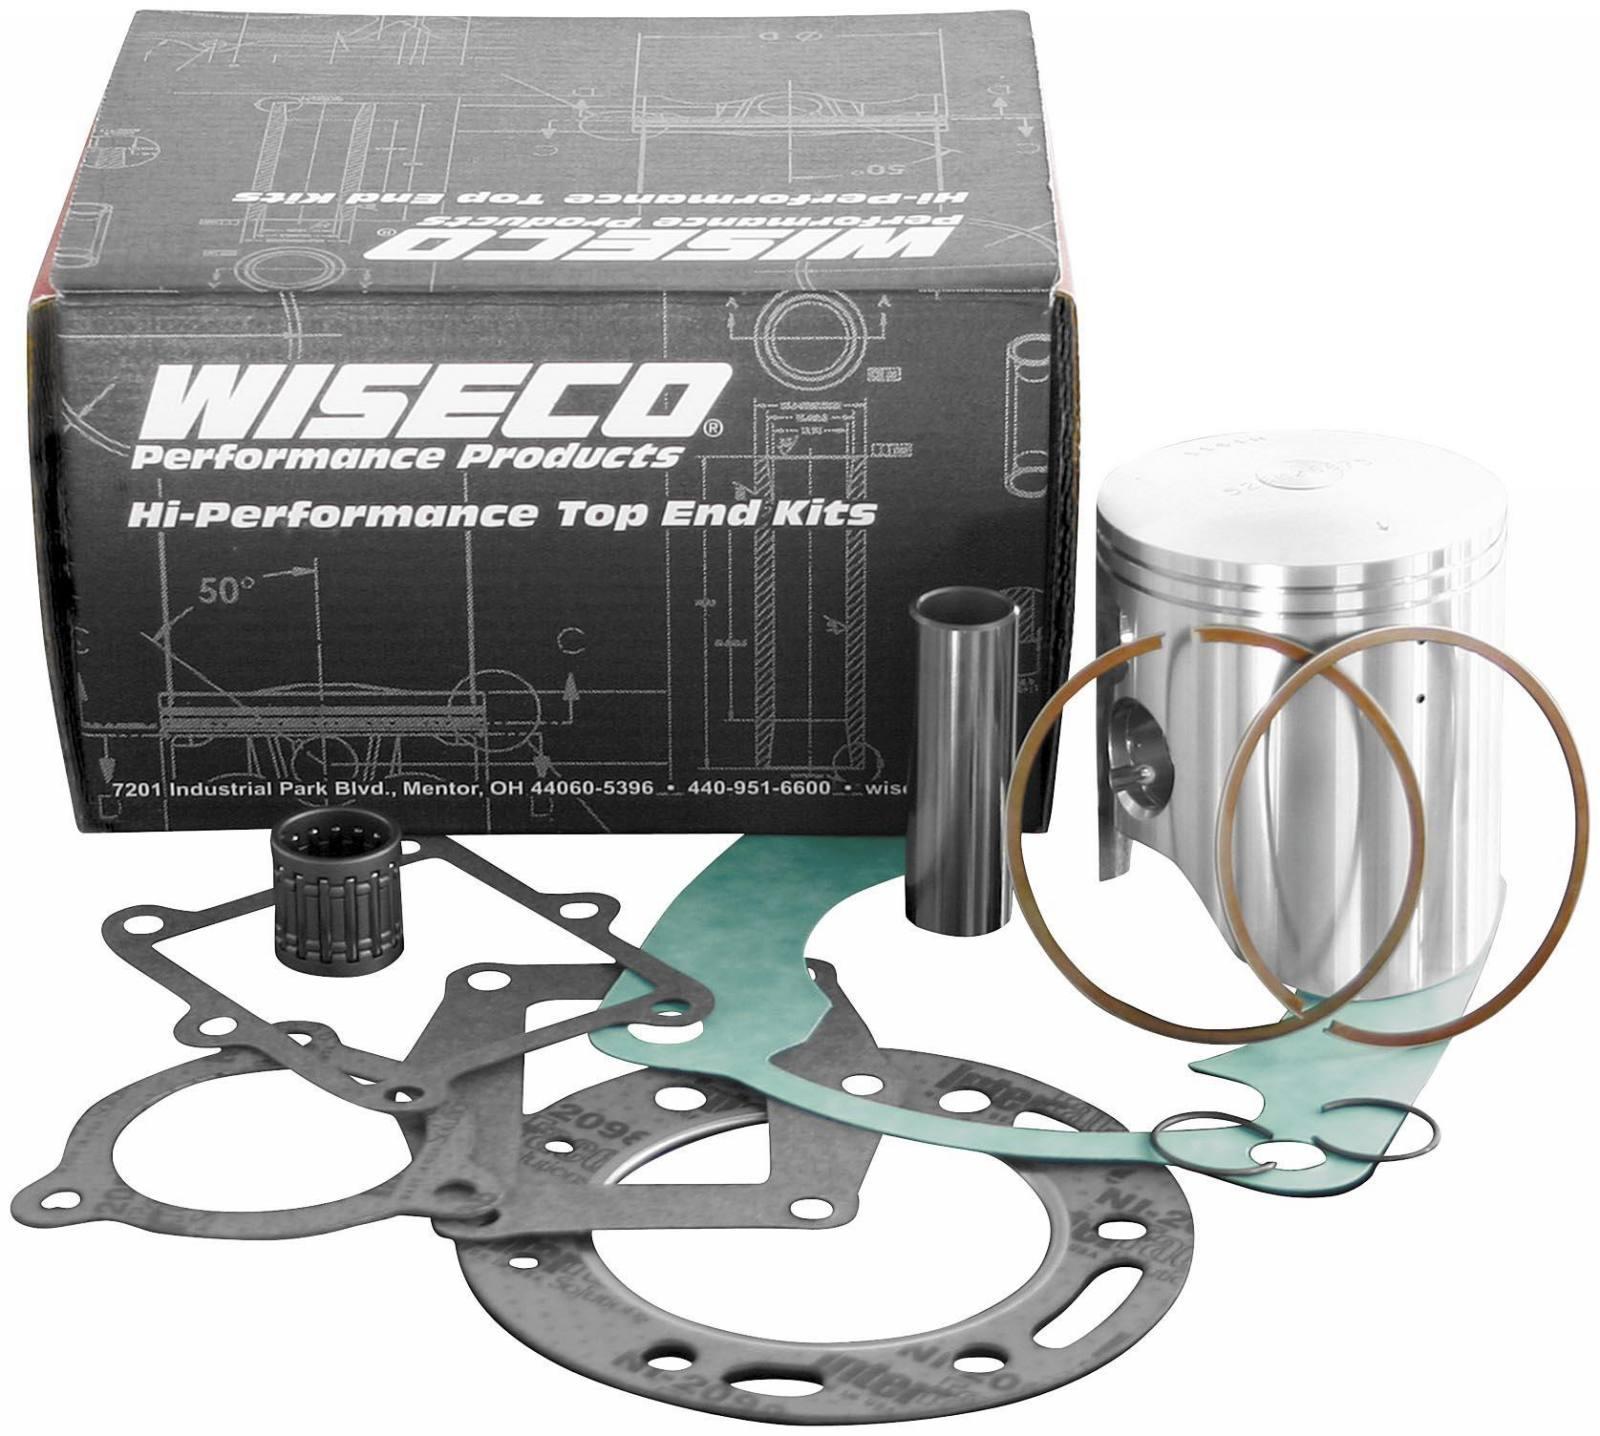 70.50mm 2-Stroke Piston Kit for Polaris Snowmobile Wiseco SK1281